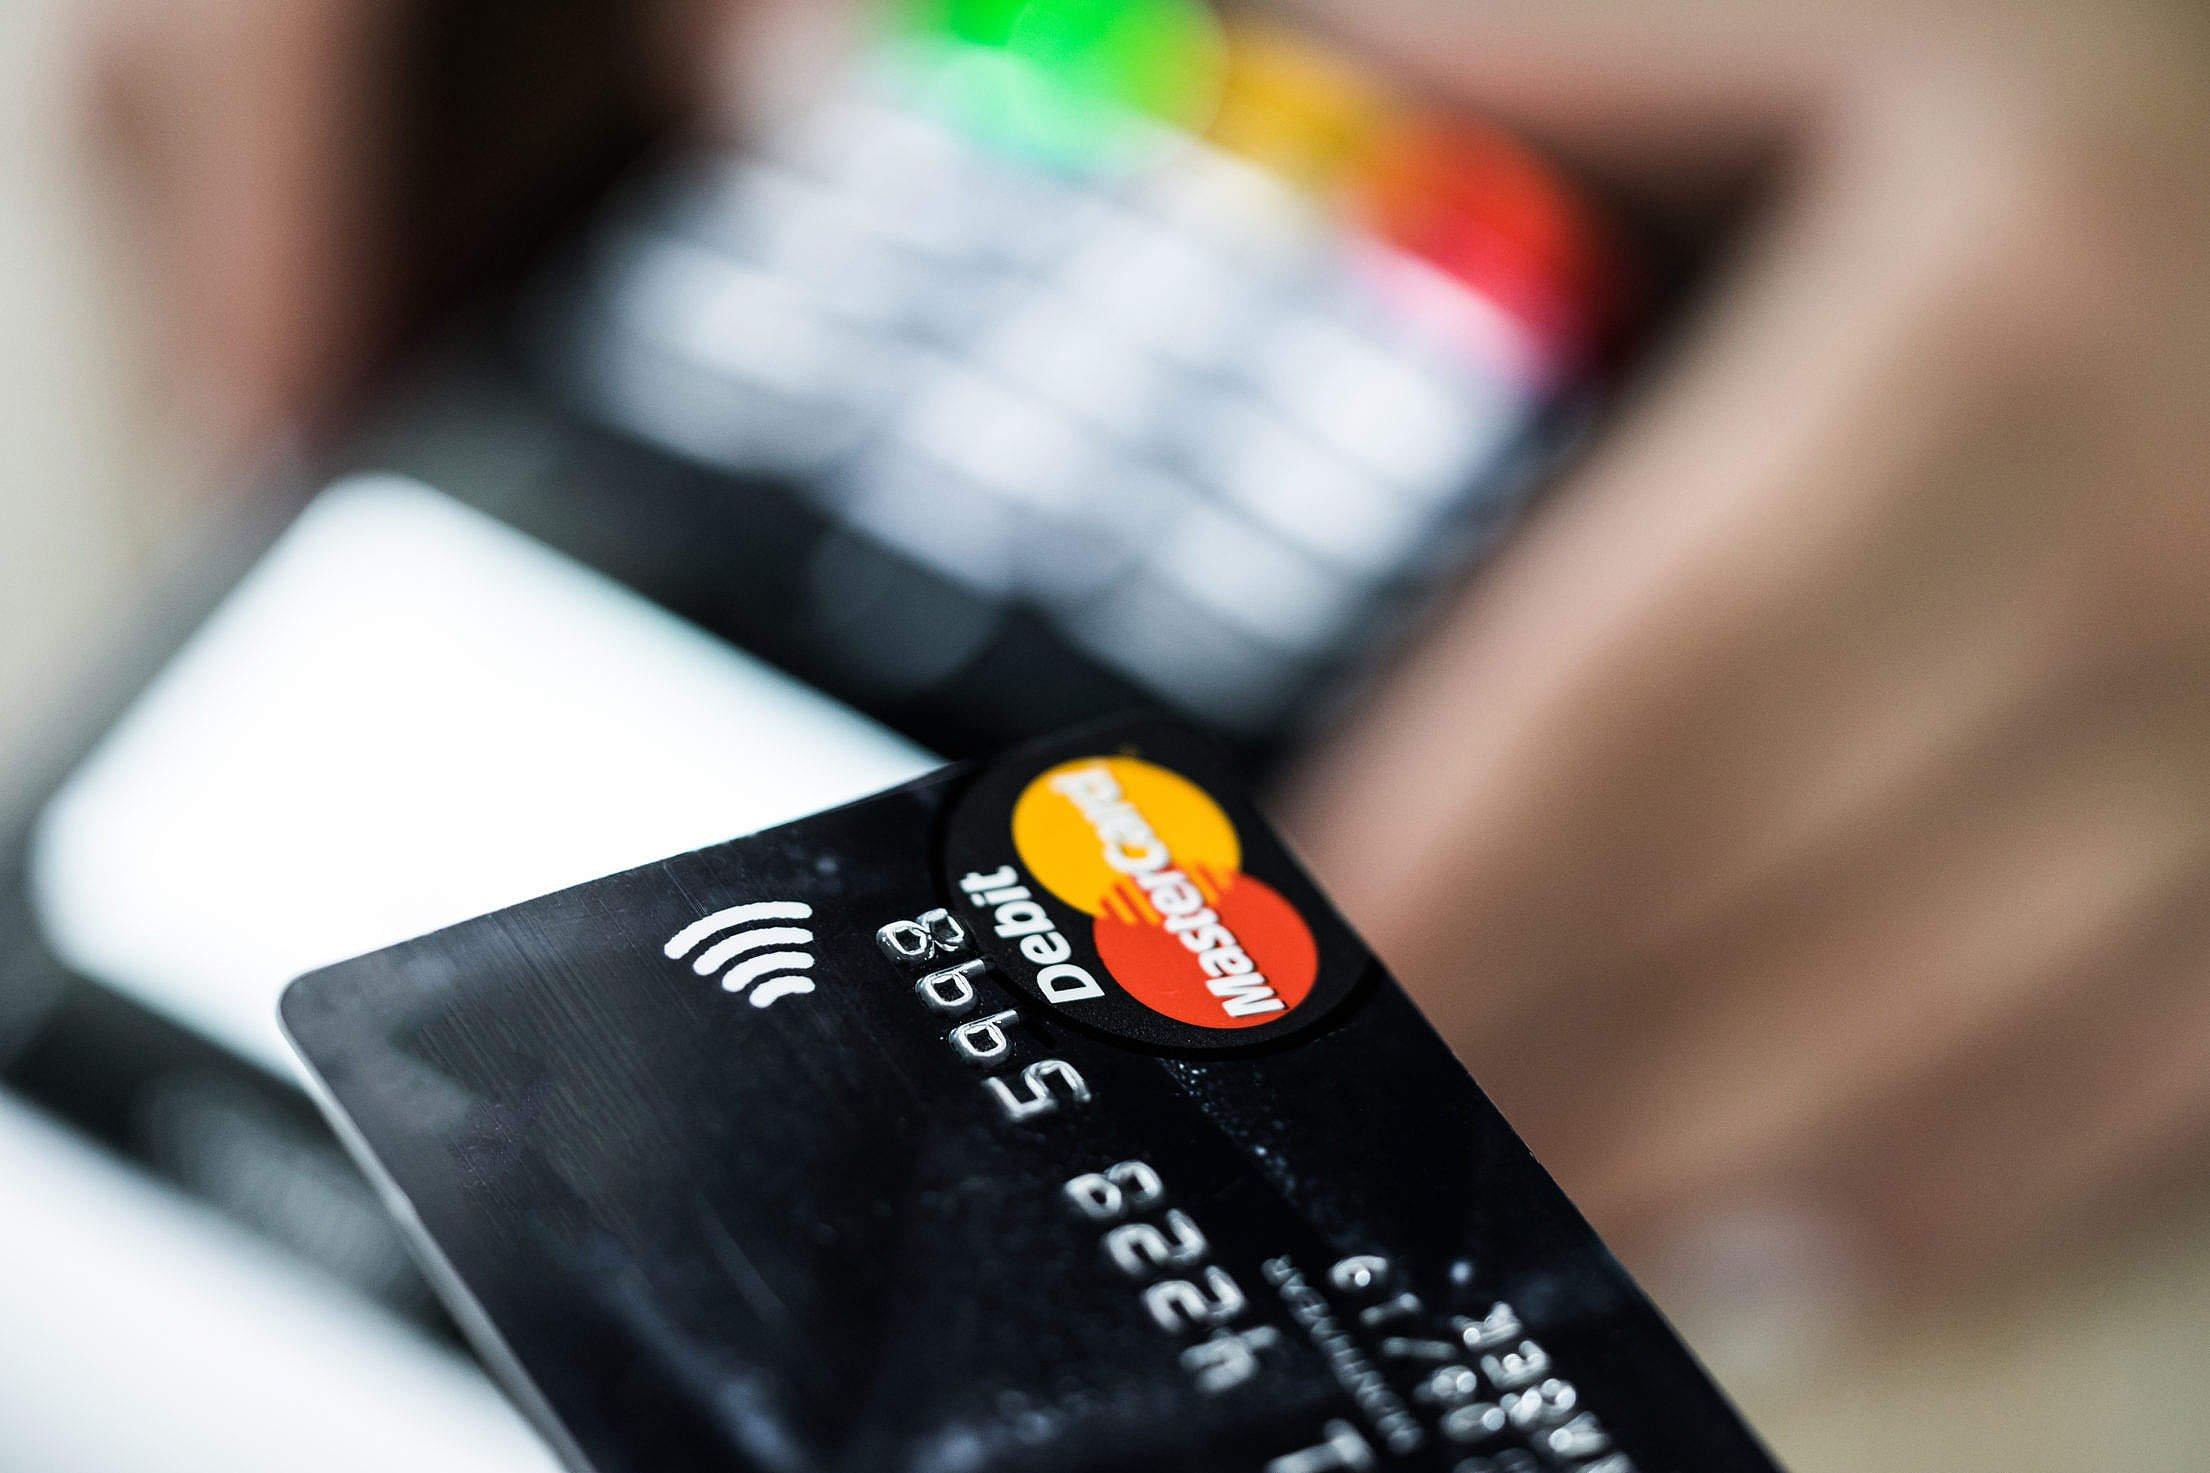 credit-card-payment-2210x1473-999940-pUrNoJ0n